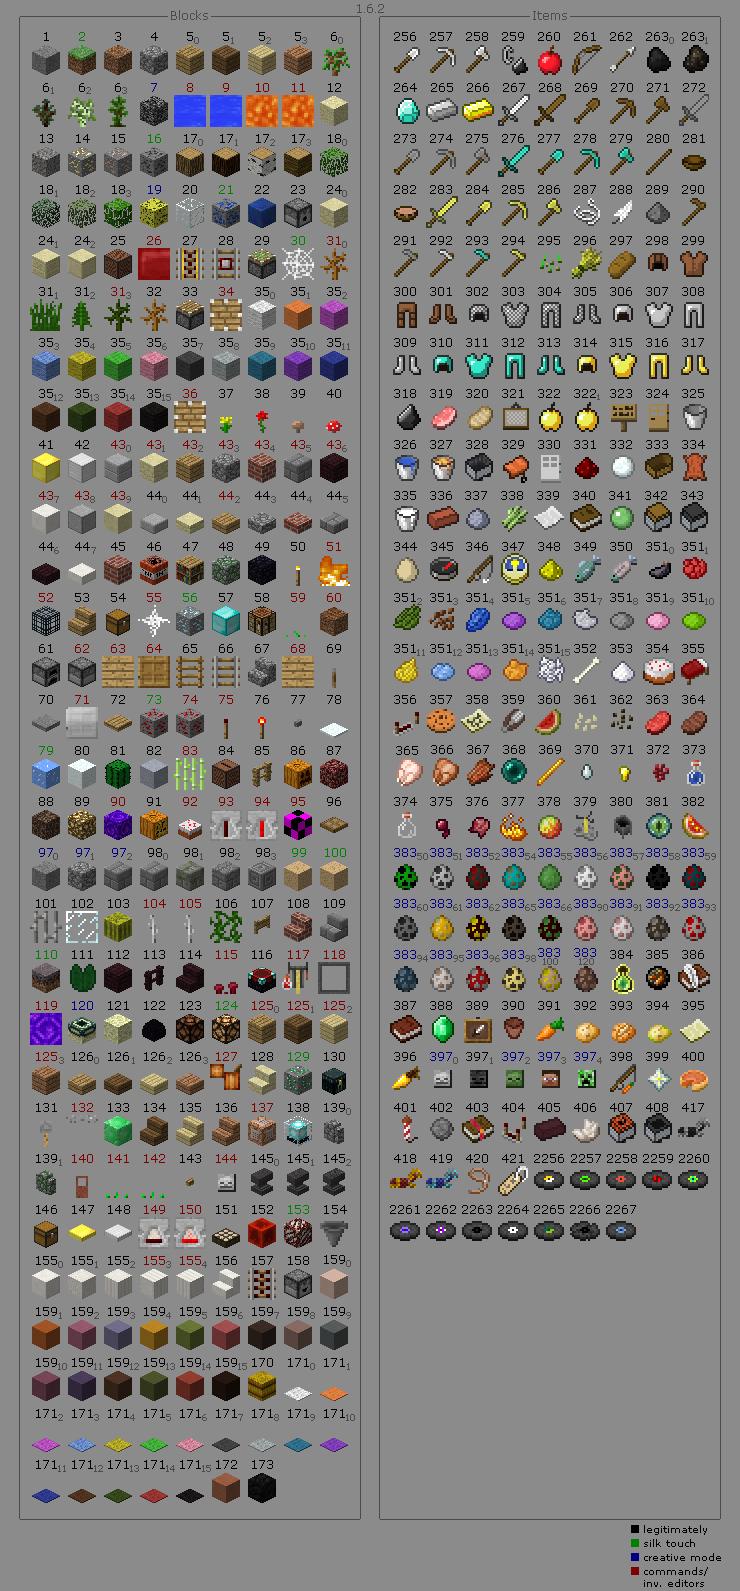 minecraft item id list minecraft info - Minecraft ID List - Minecraft Info